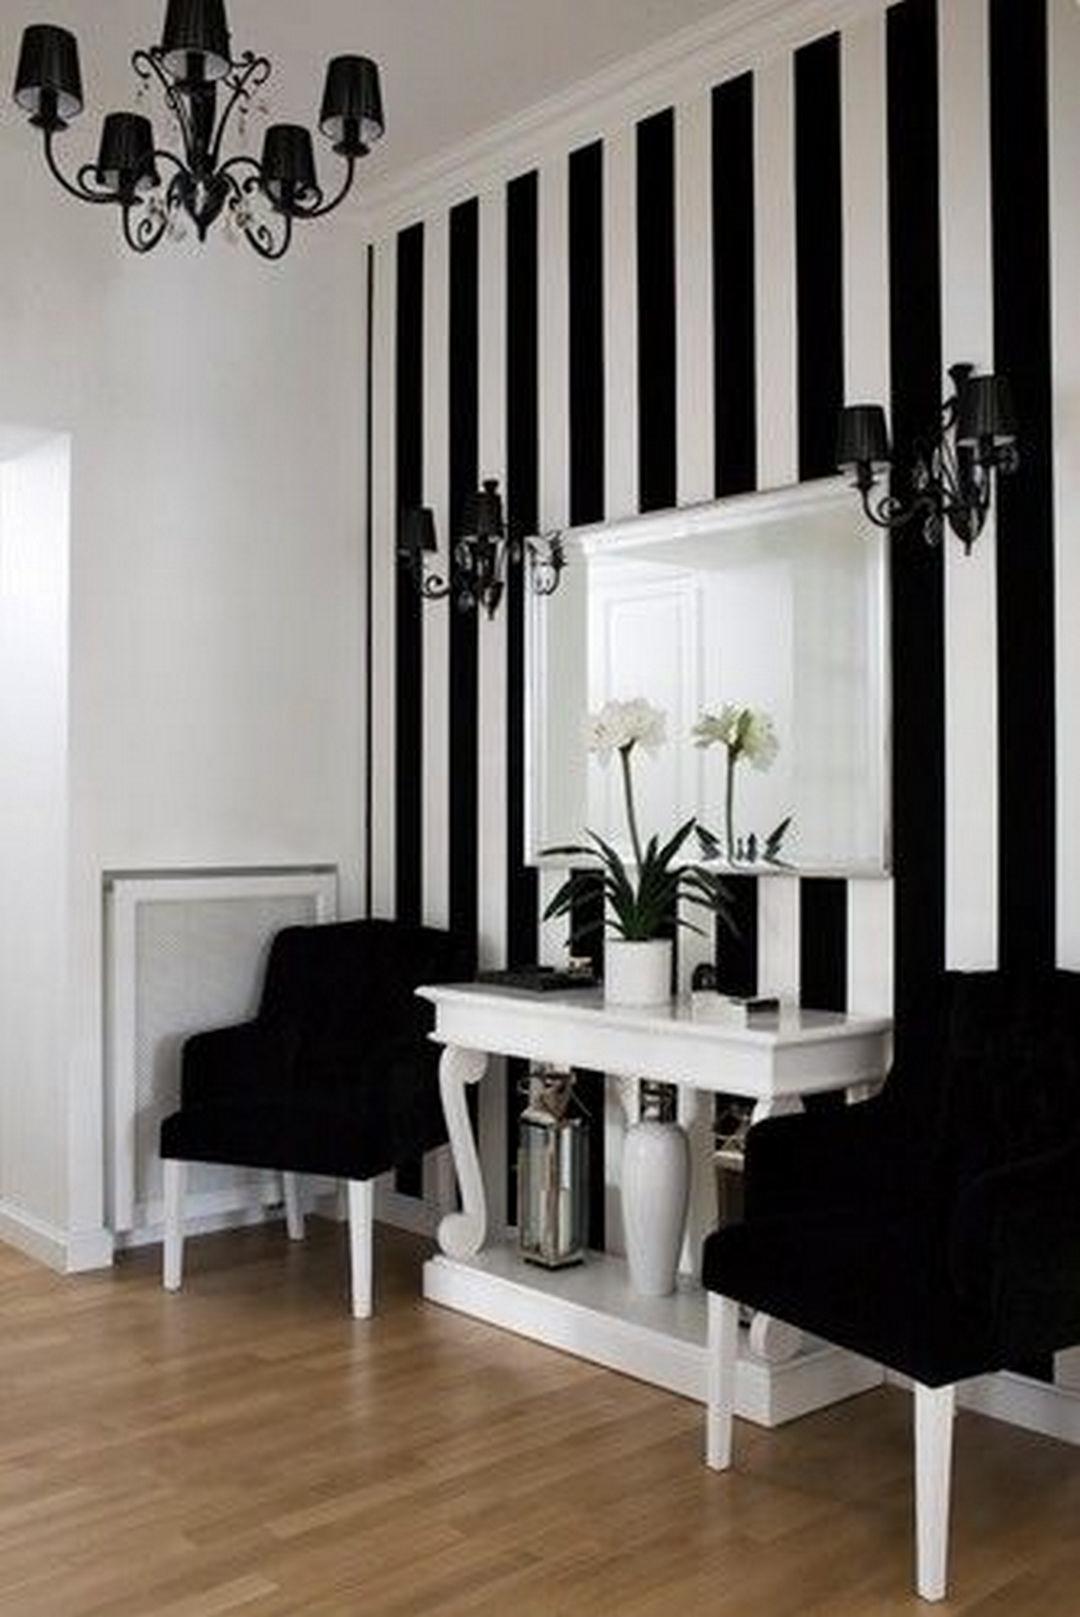 The House Black & White: Elegant Interior of A Big